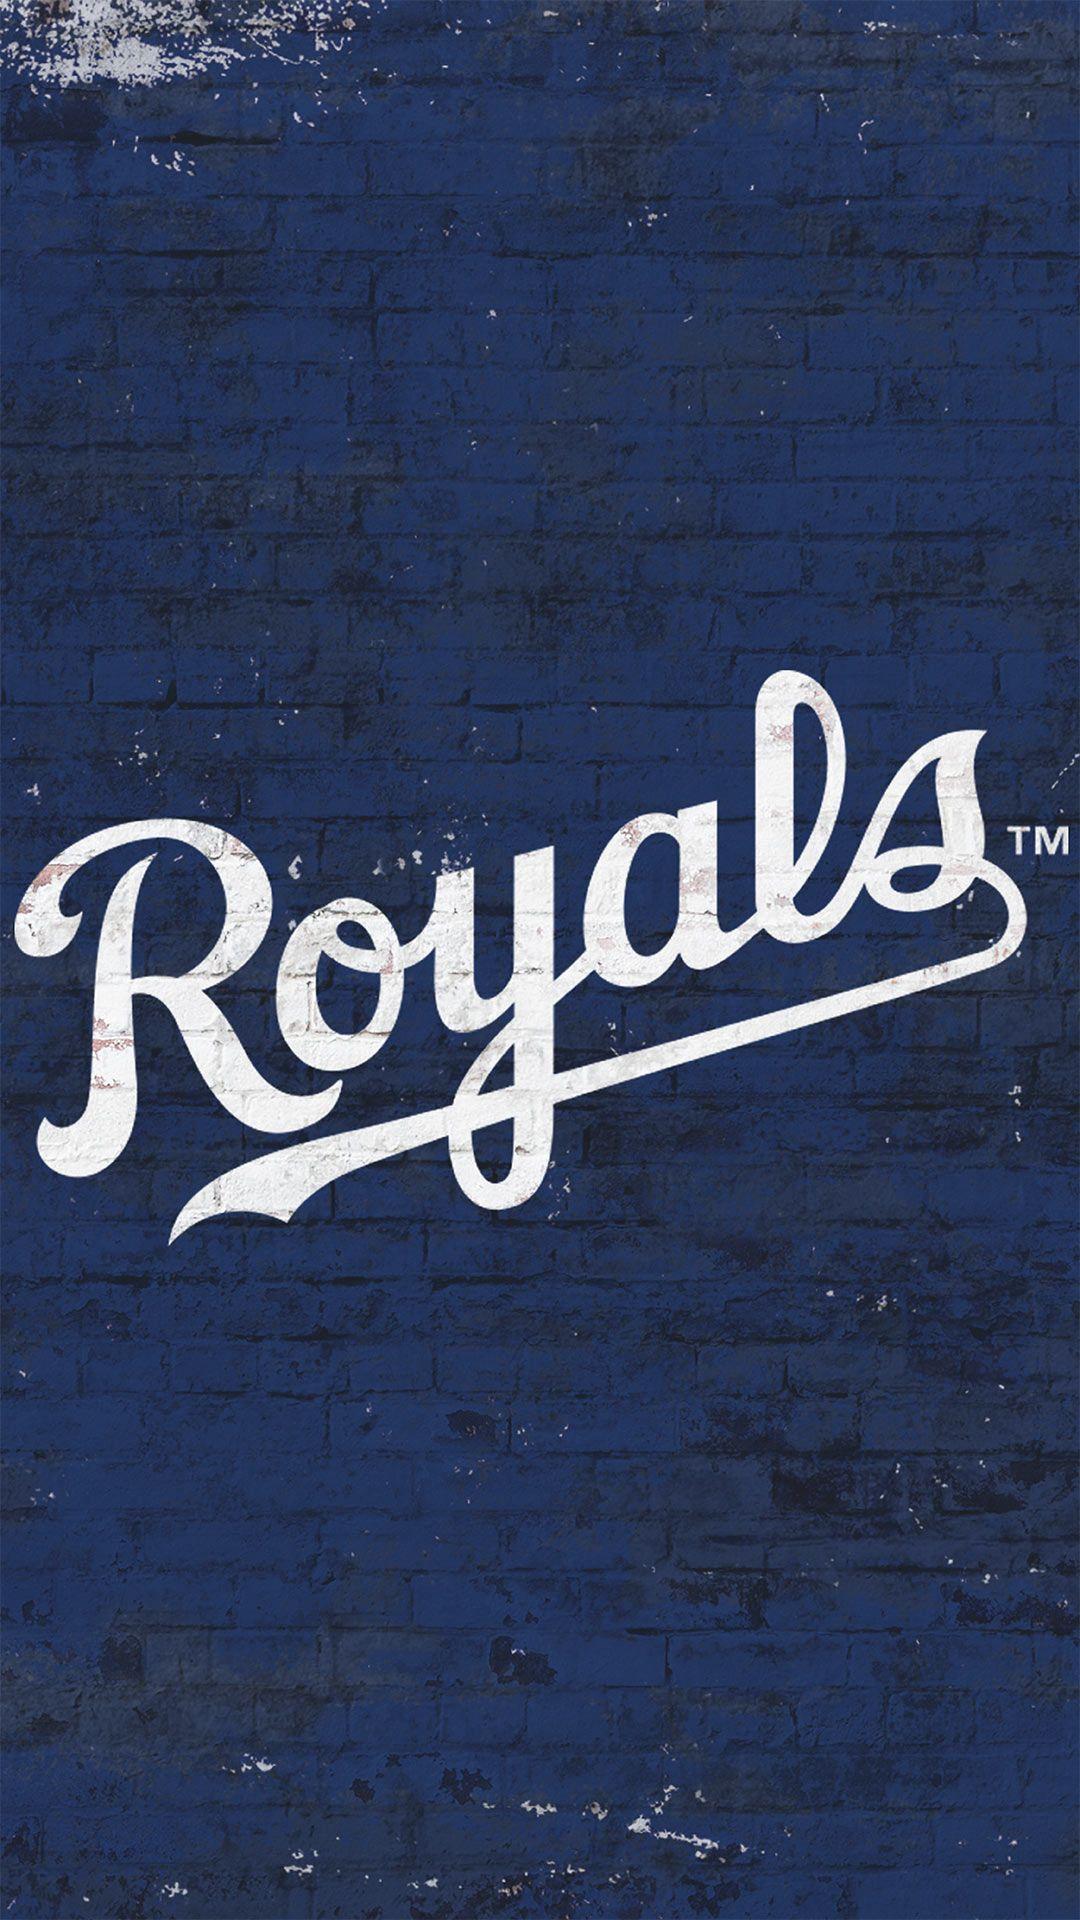 Royals Wallpapers   Top Royals Backgrounds   WallpaperAccess 1080x1920